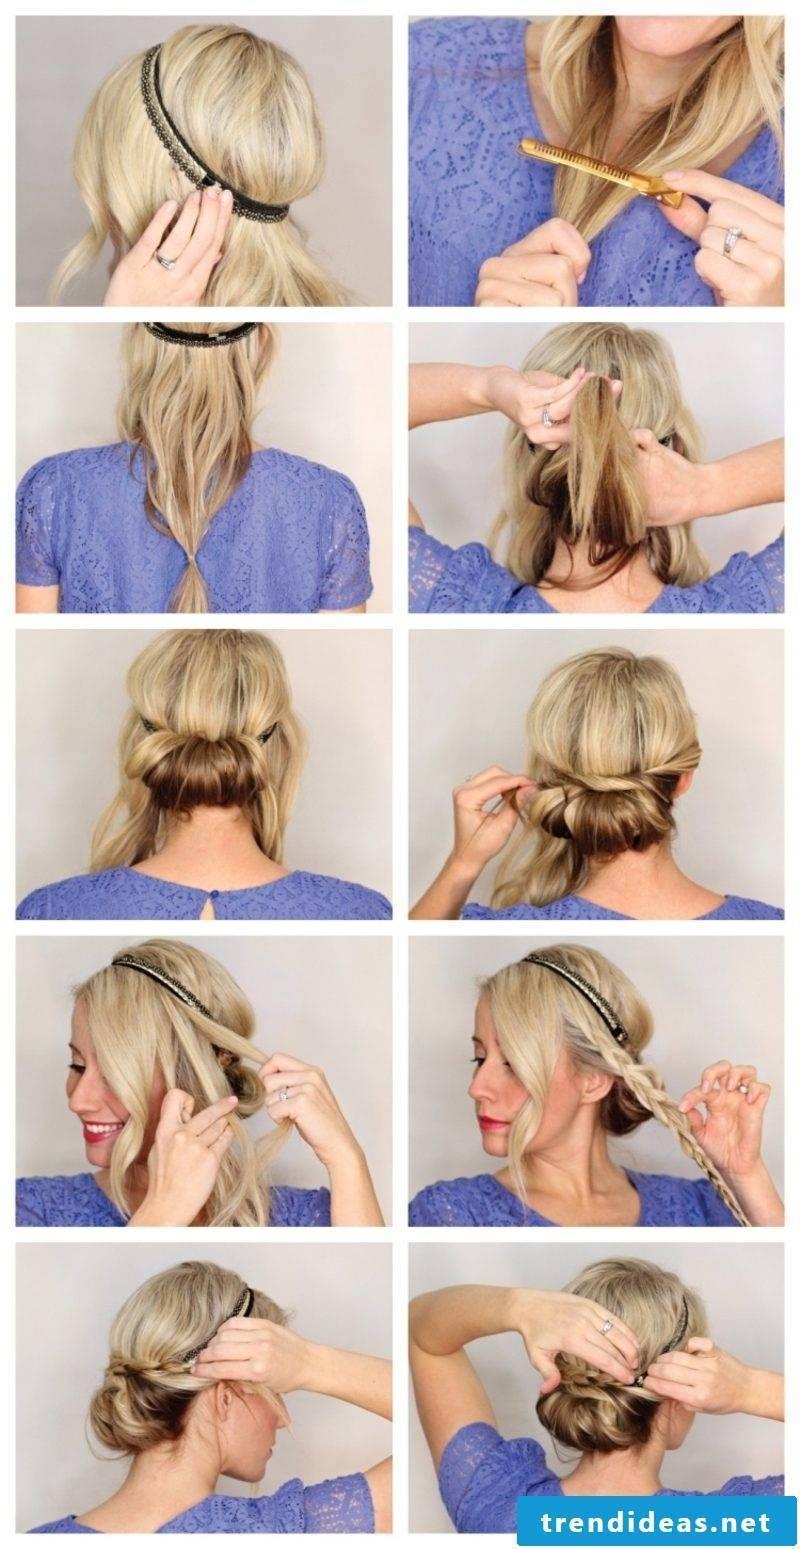 Hairstyles medium-length hair pinned hairband